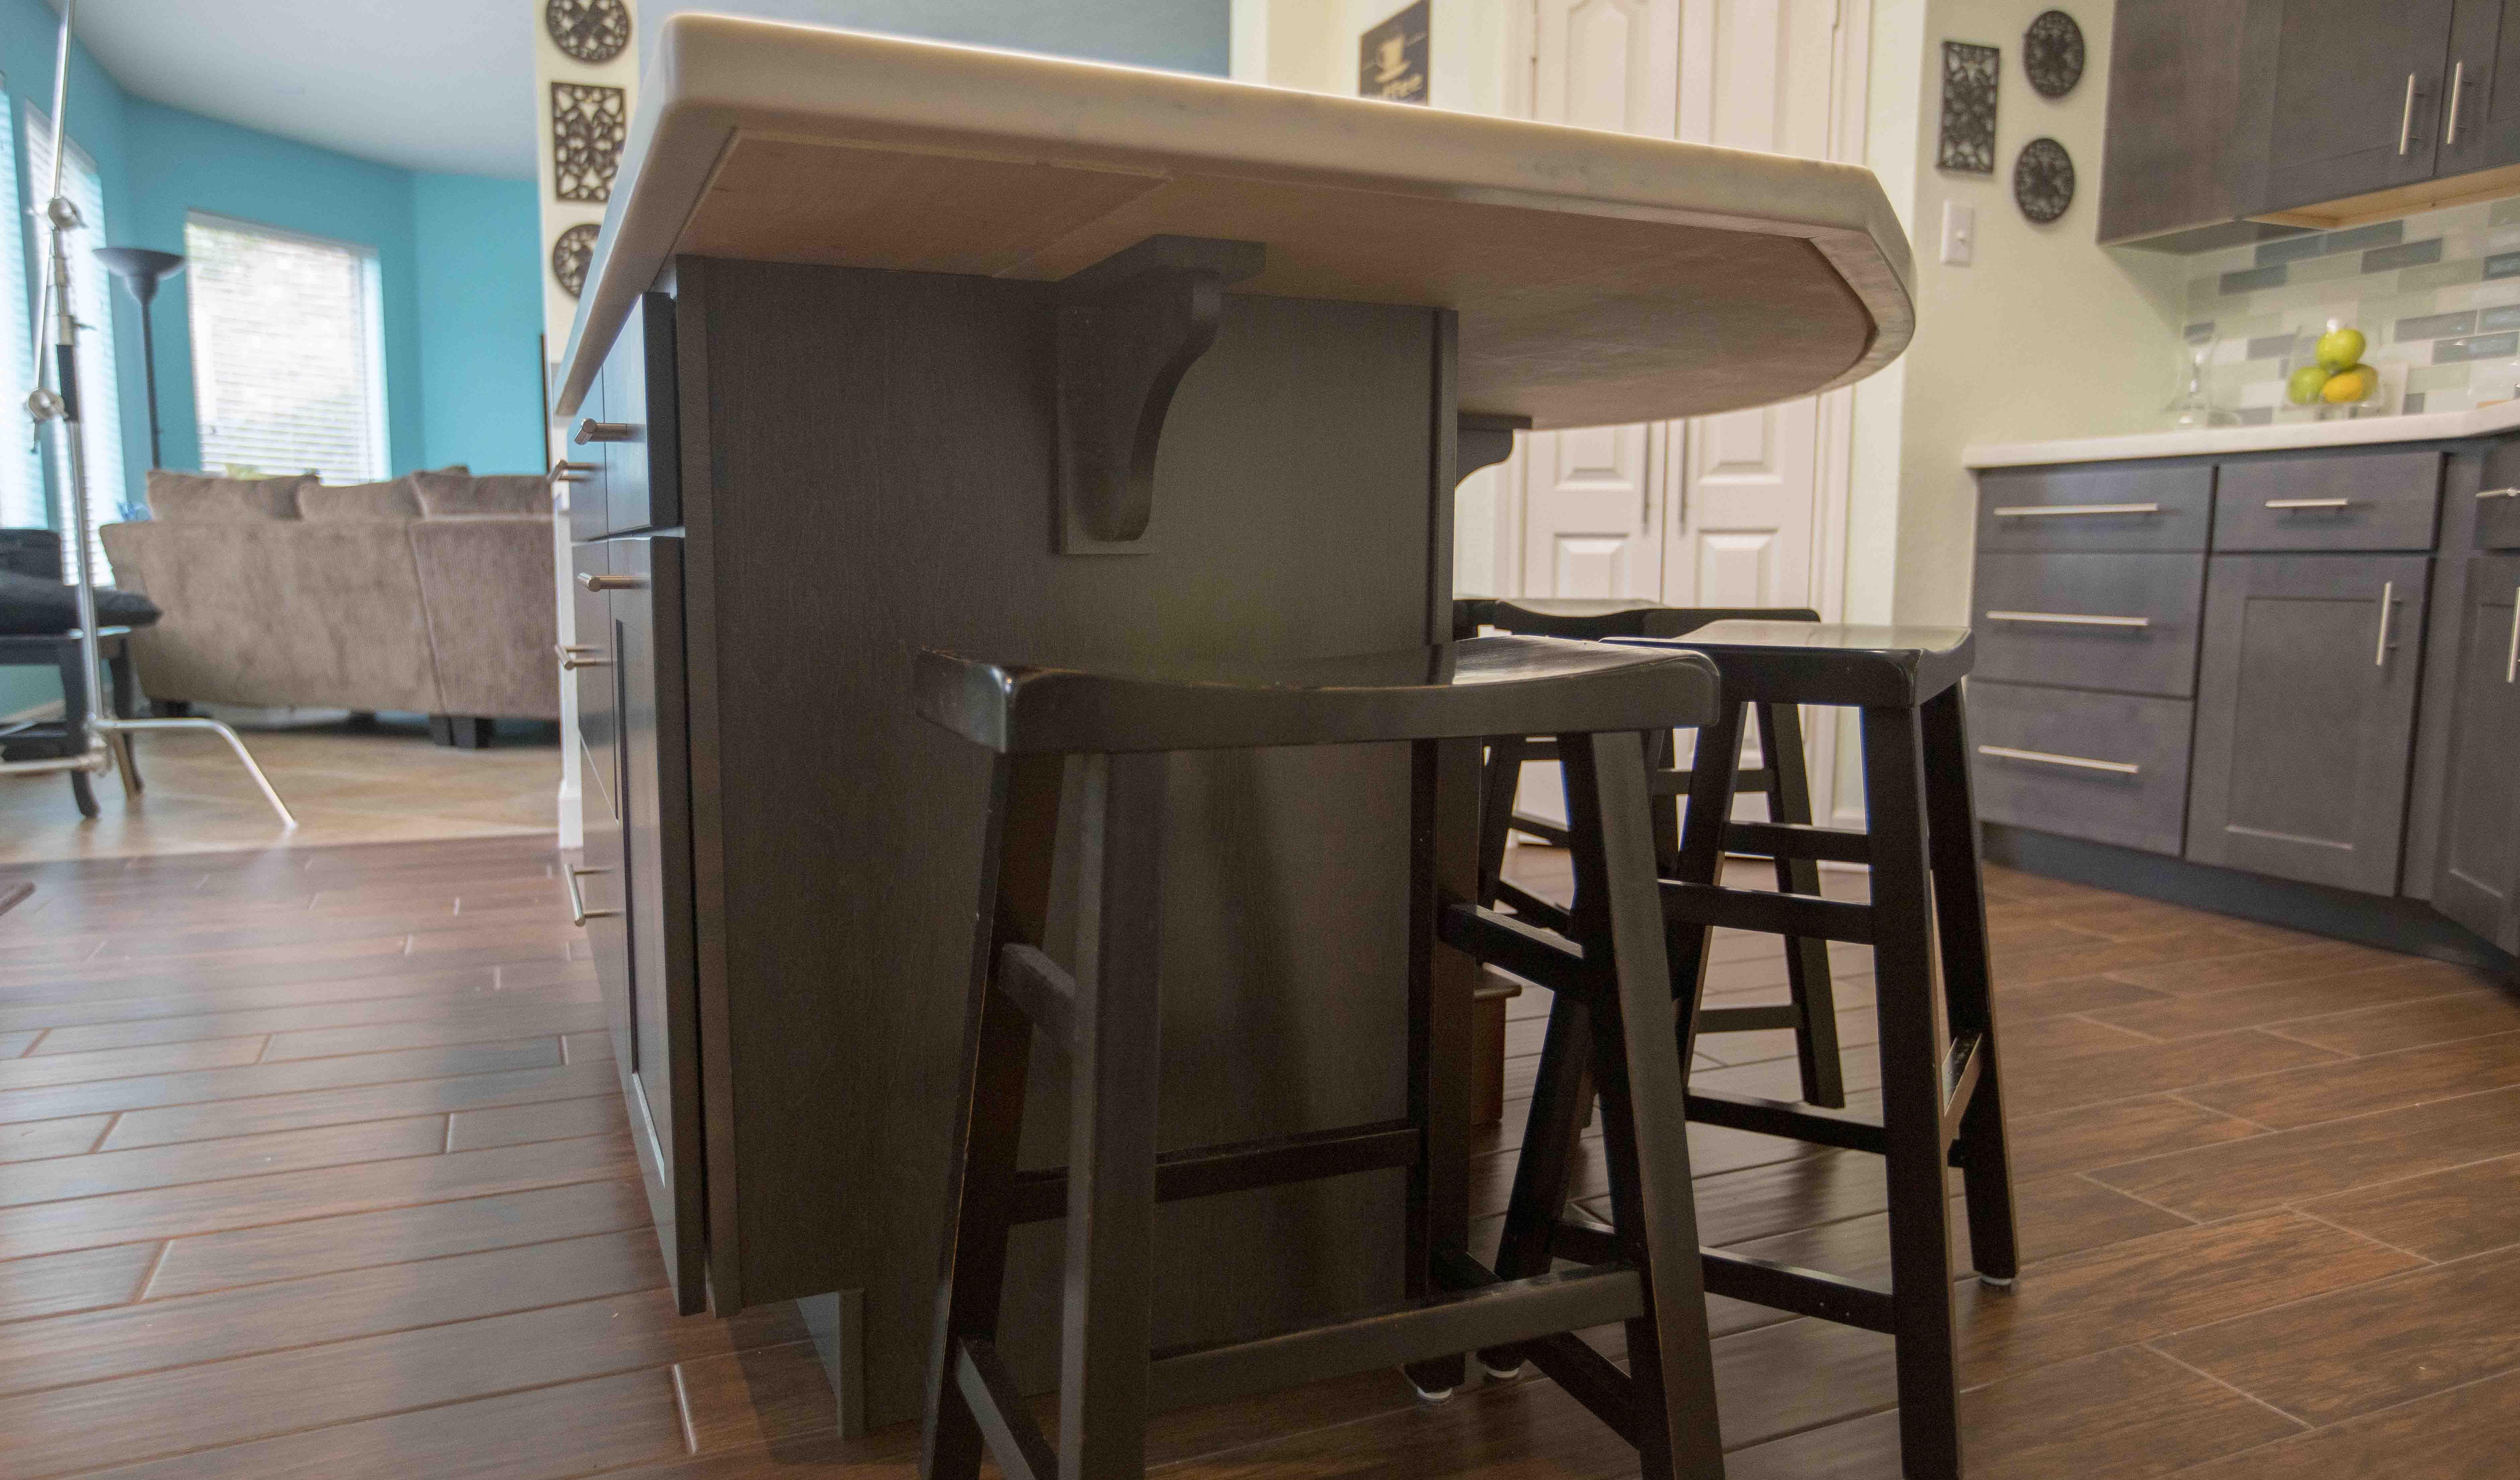 Kitchen Remodeling Houston Tx Bath Remodelling Usa Cabinet Store Kitchen Decor Kitchen Bar Stools Decor